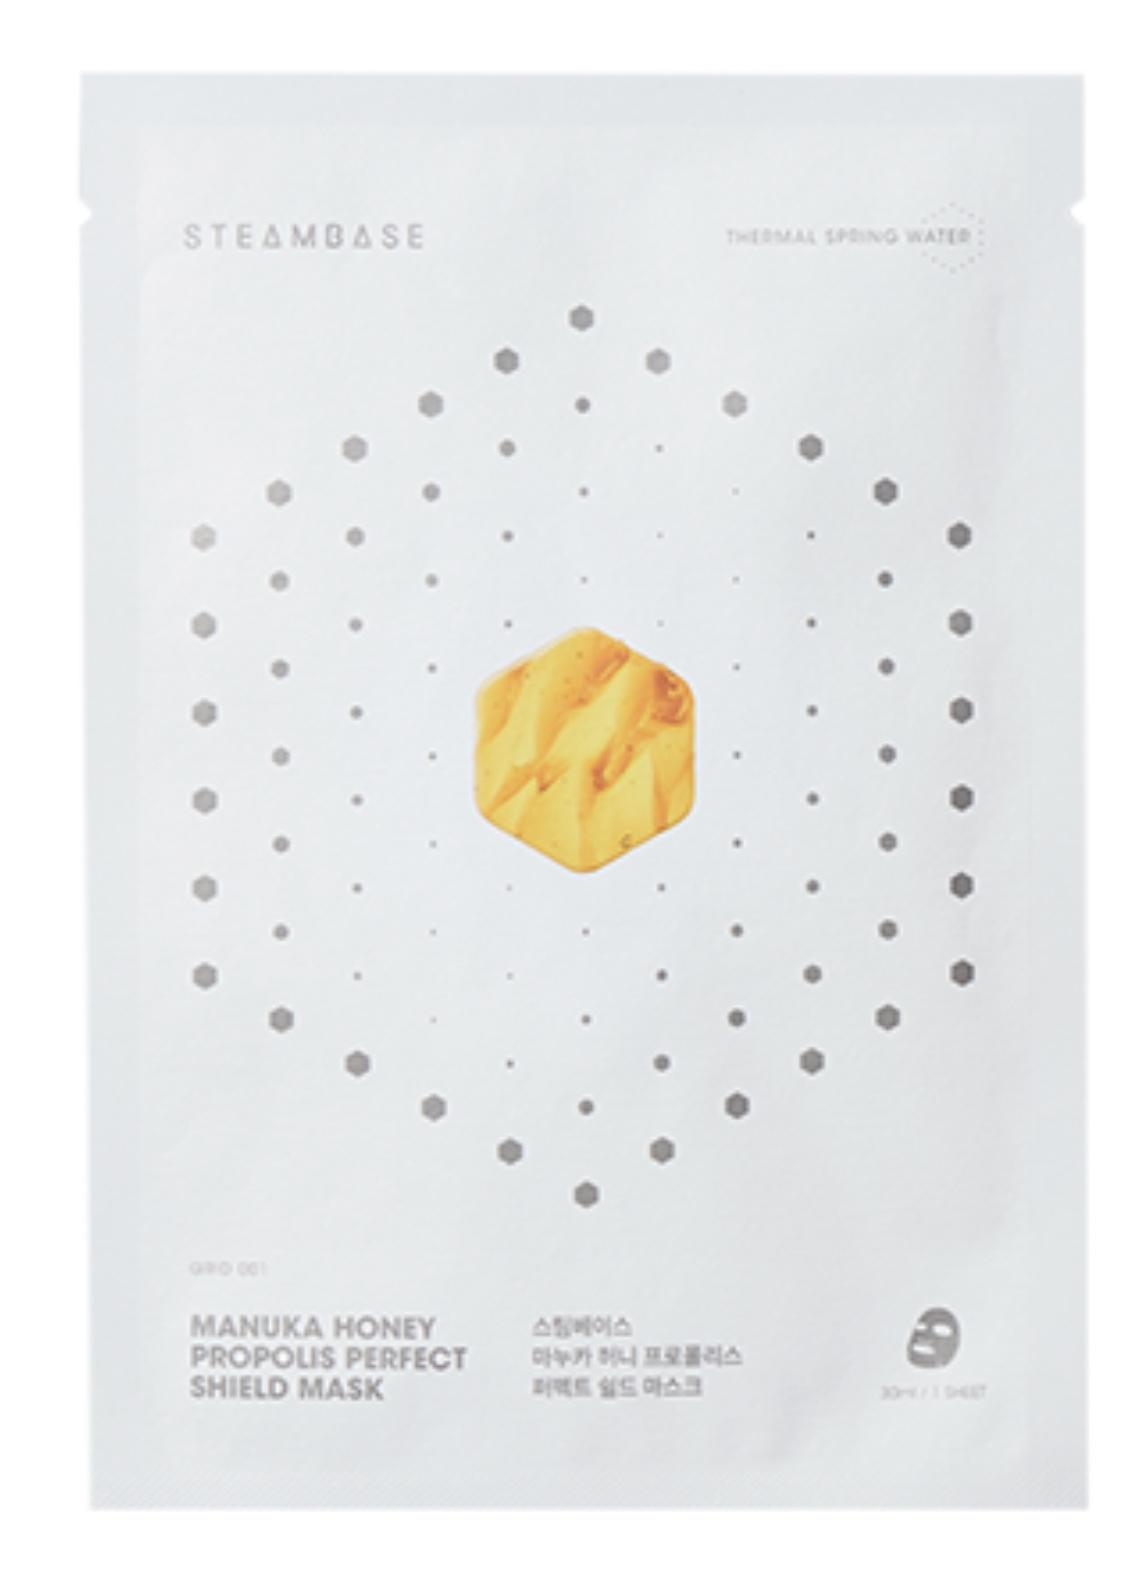 STEAMBASE Manuka Honey Propolis Perfect Shield Mask